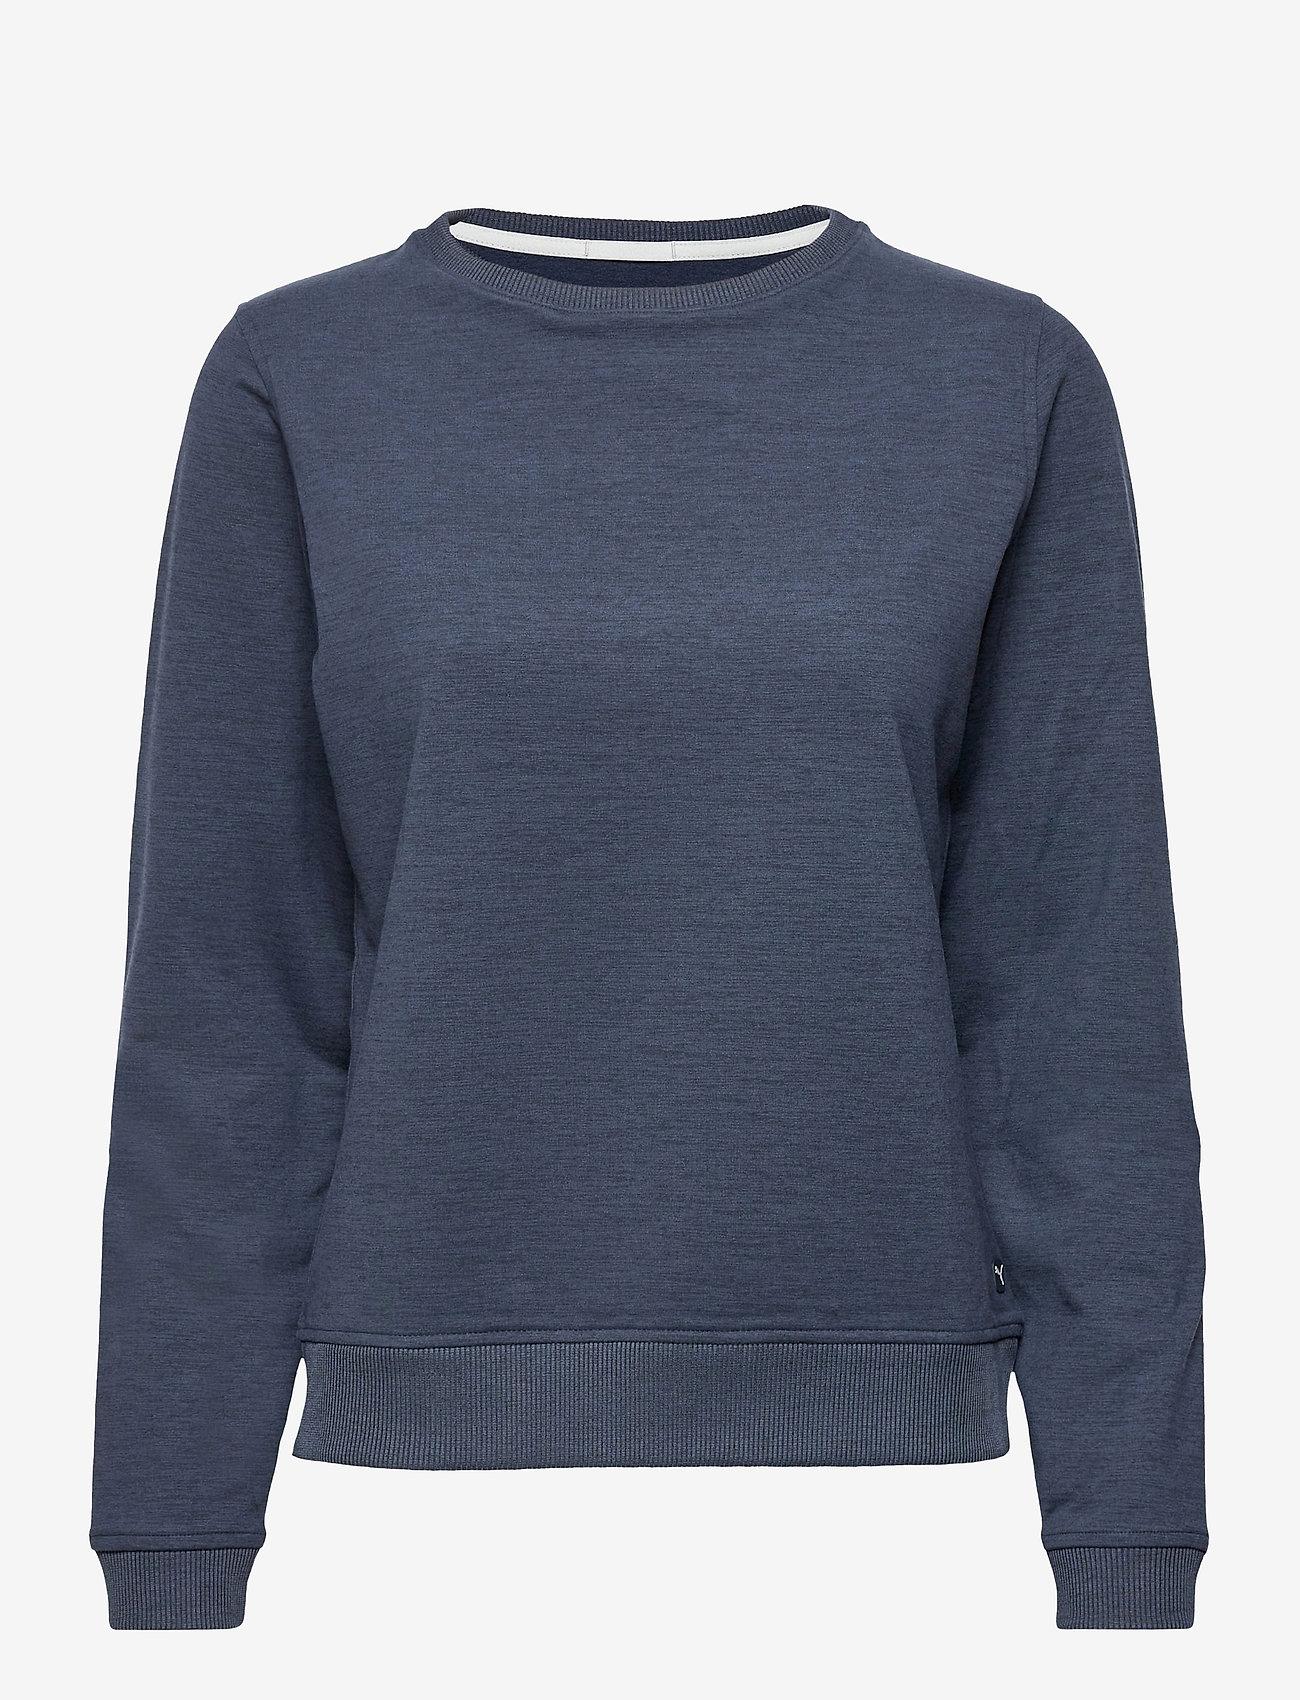 PUMA Golf - W Cloudspun Crewneck - sweatshirts - navy blazer heather - 0